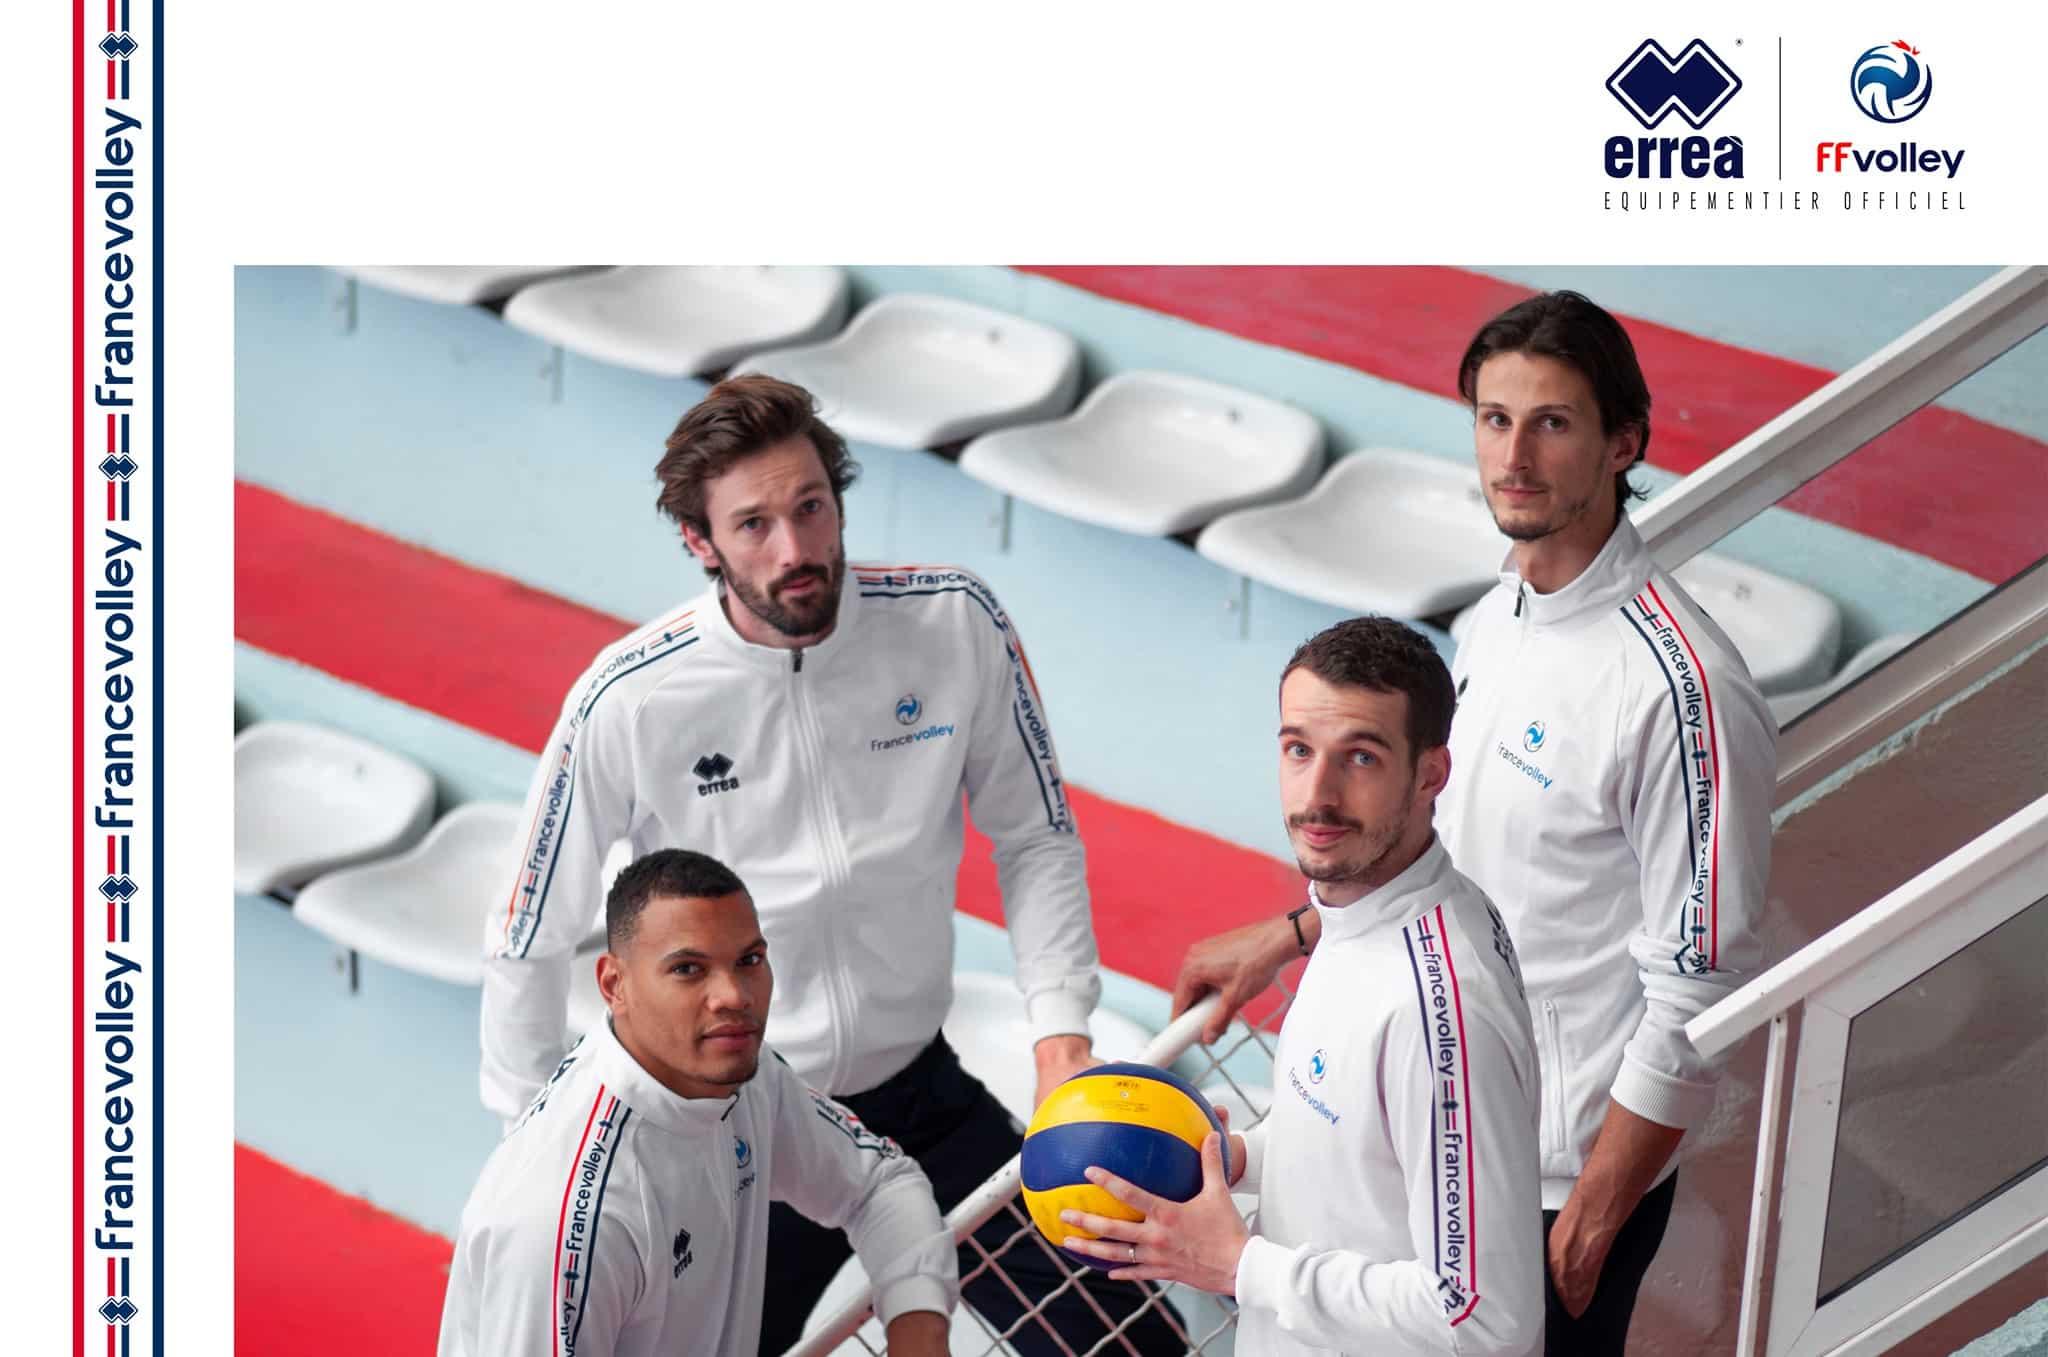 un-nouveau-maillot-errea-de-lequipe-de-france-de-volley-a-venir-1